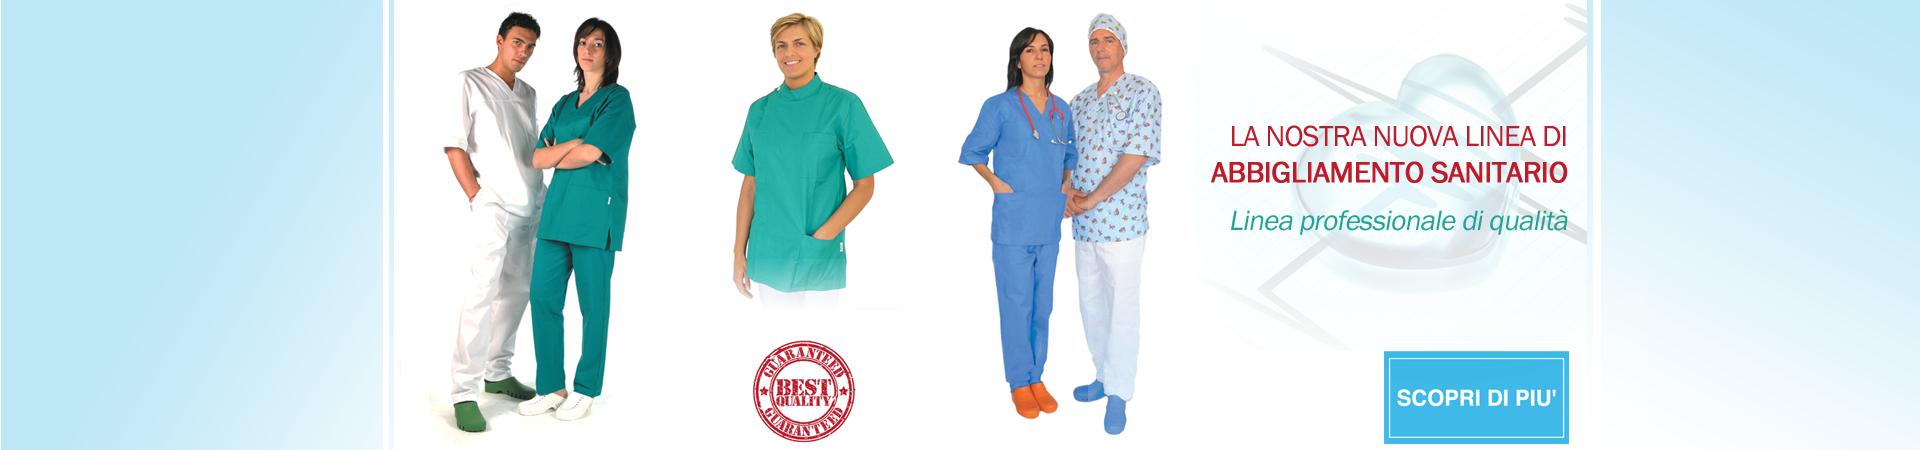 Defibrillatore Ortopedia | Elettromedicali | Forniture Ospedaliere | Medisanshop.com